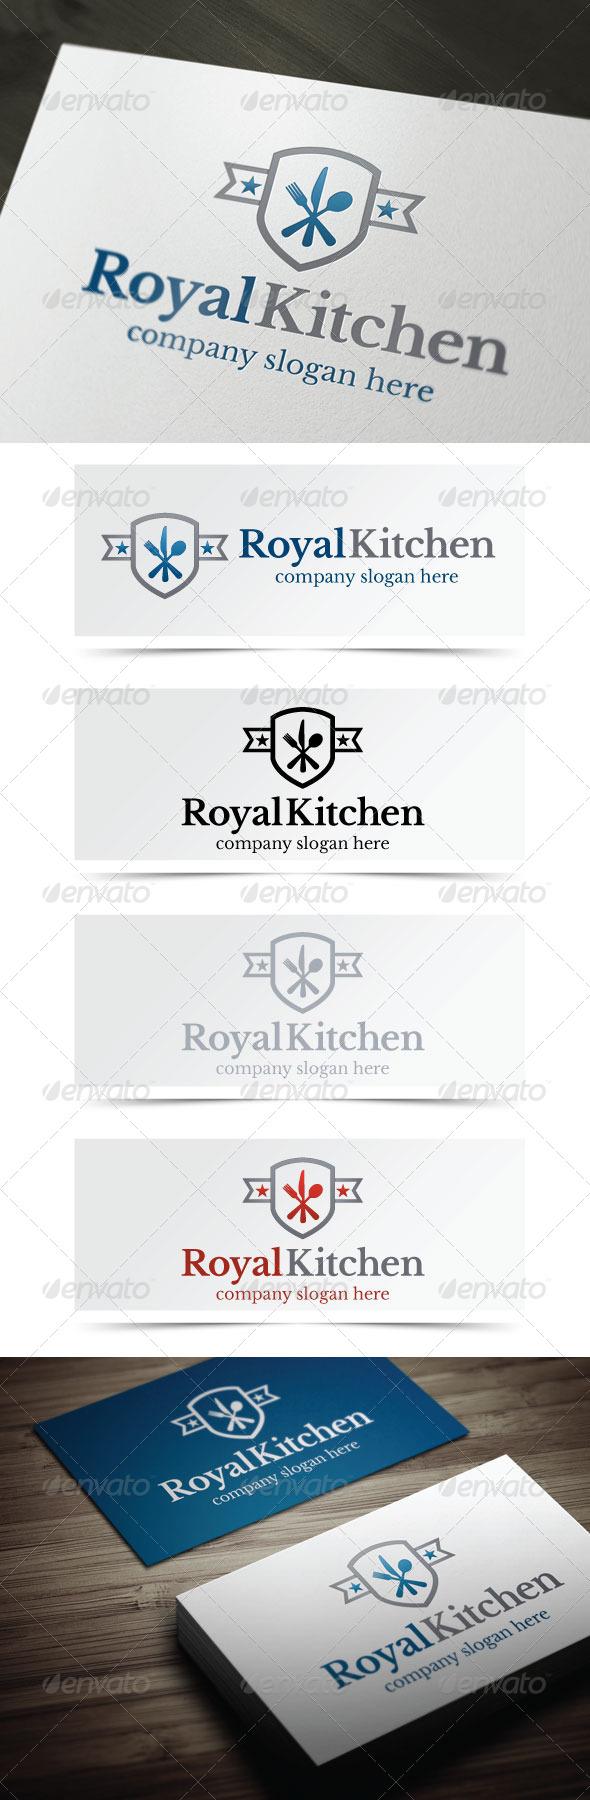 Royal Kitchen - Food Logo Templates